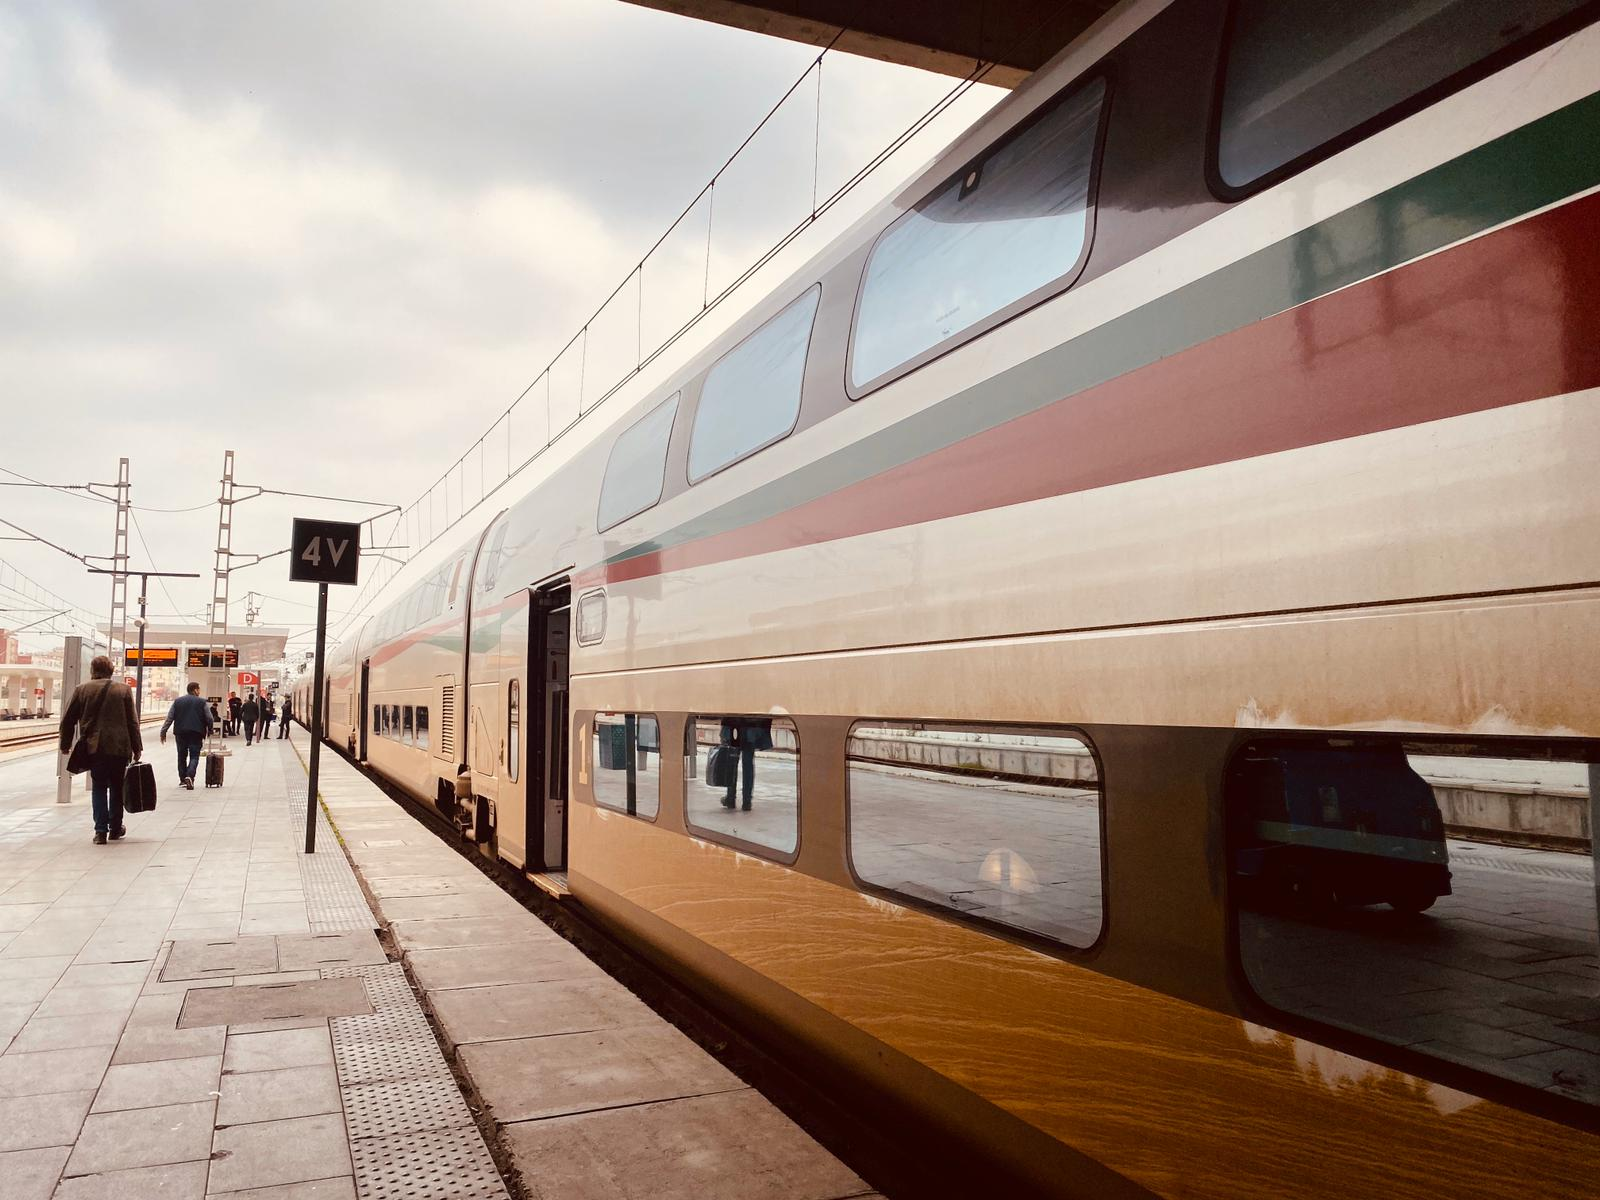 al boraq oncf morocco high speed train travel casablanca bruce marais